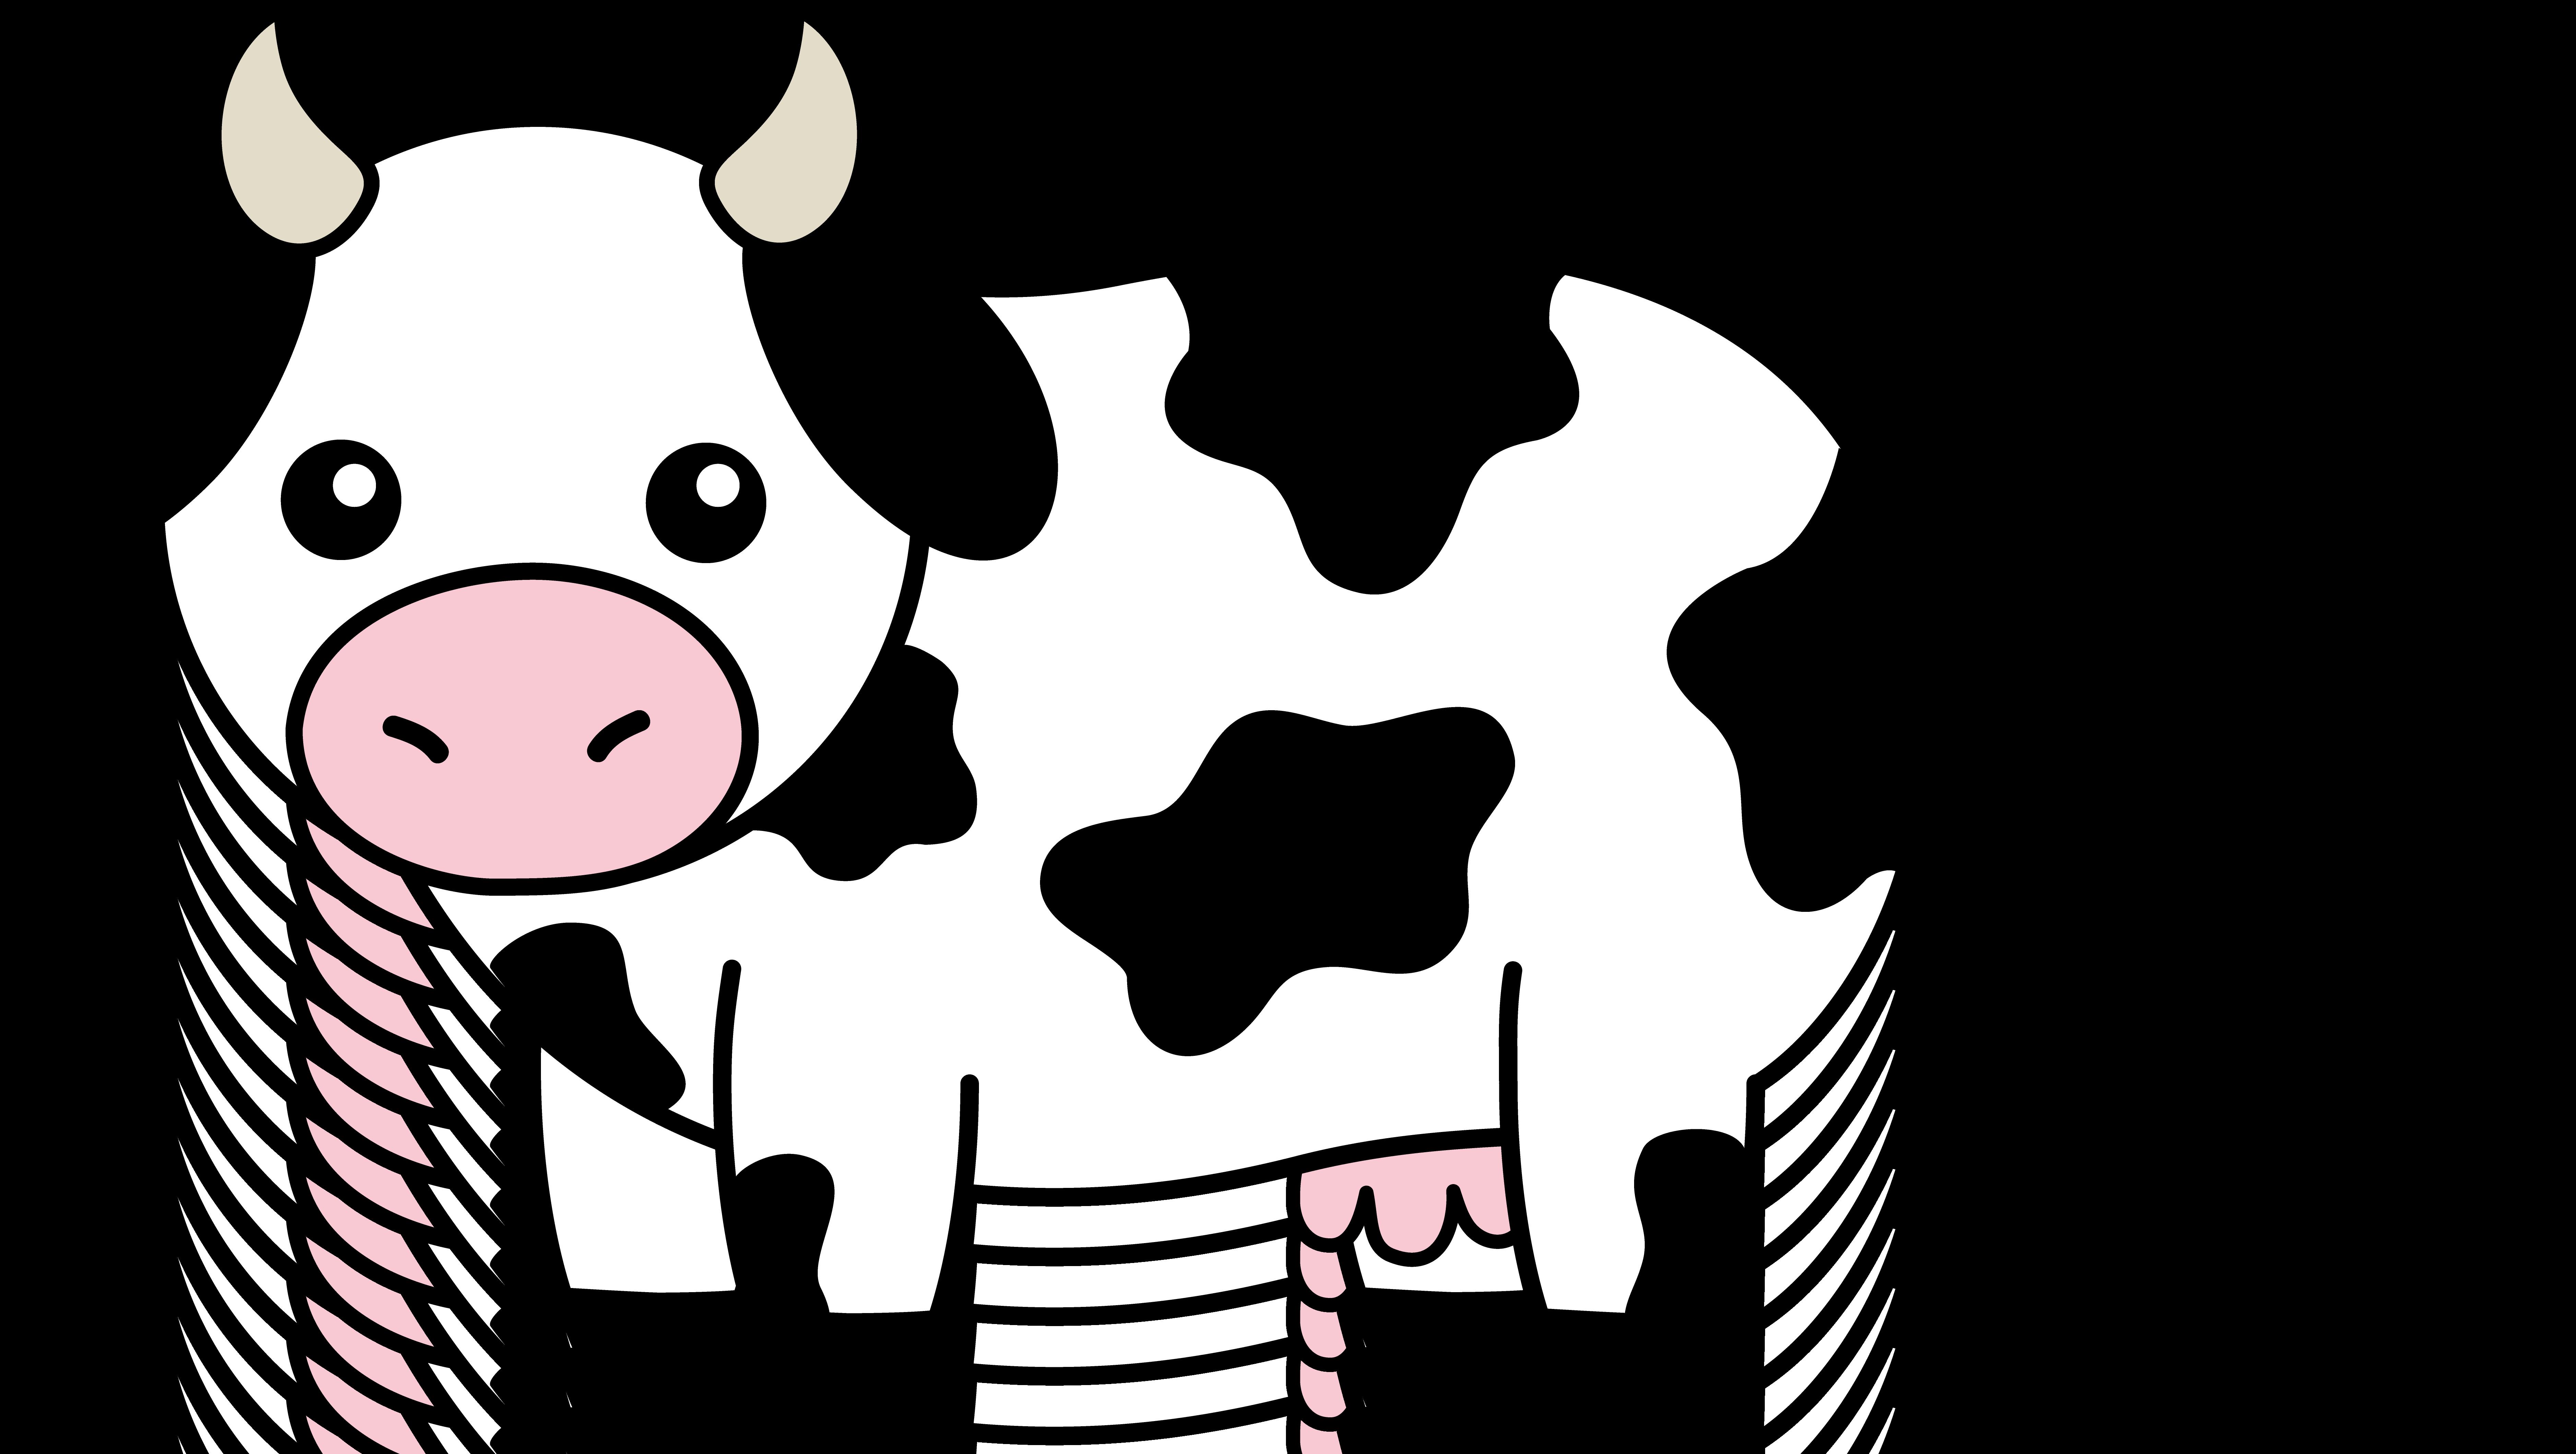 Cow free angus clip art angus merchandise cattle clip - Clipartix